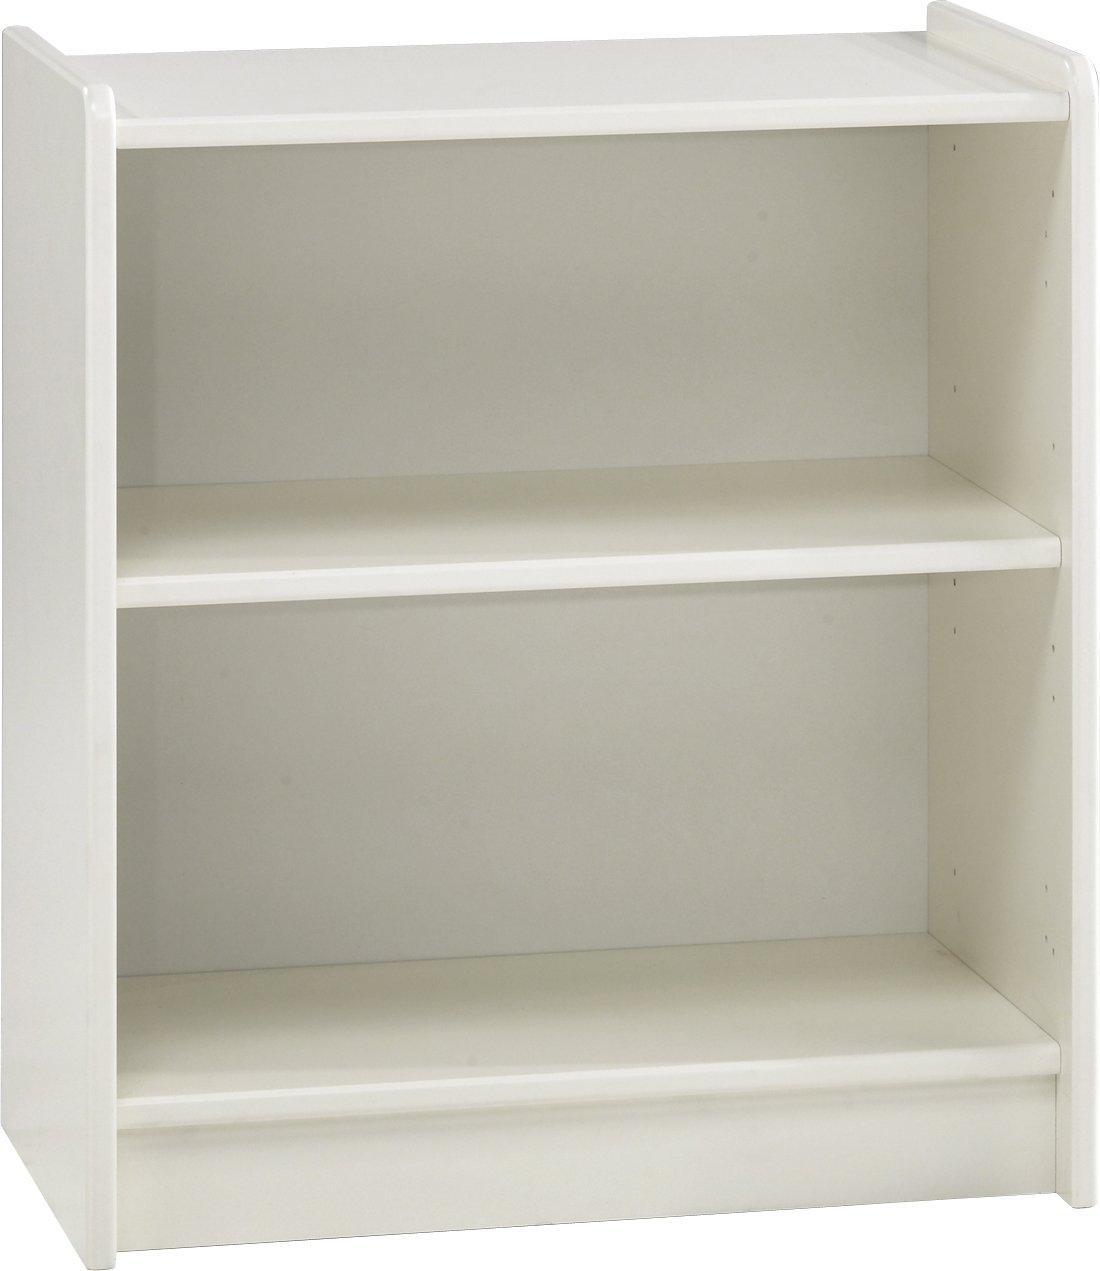 100 white bookcase shelves popamazing 6 tier 192cm tall woo